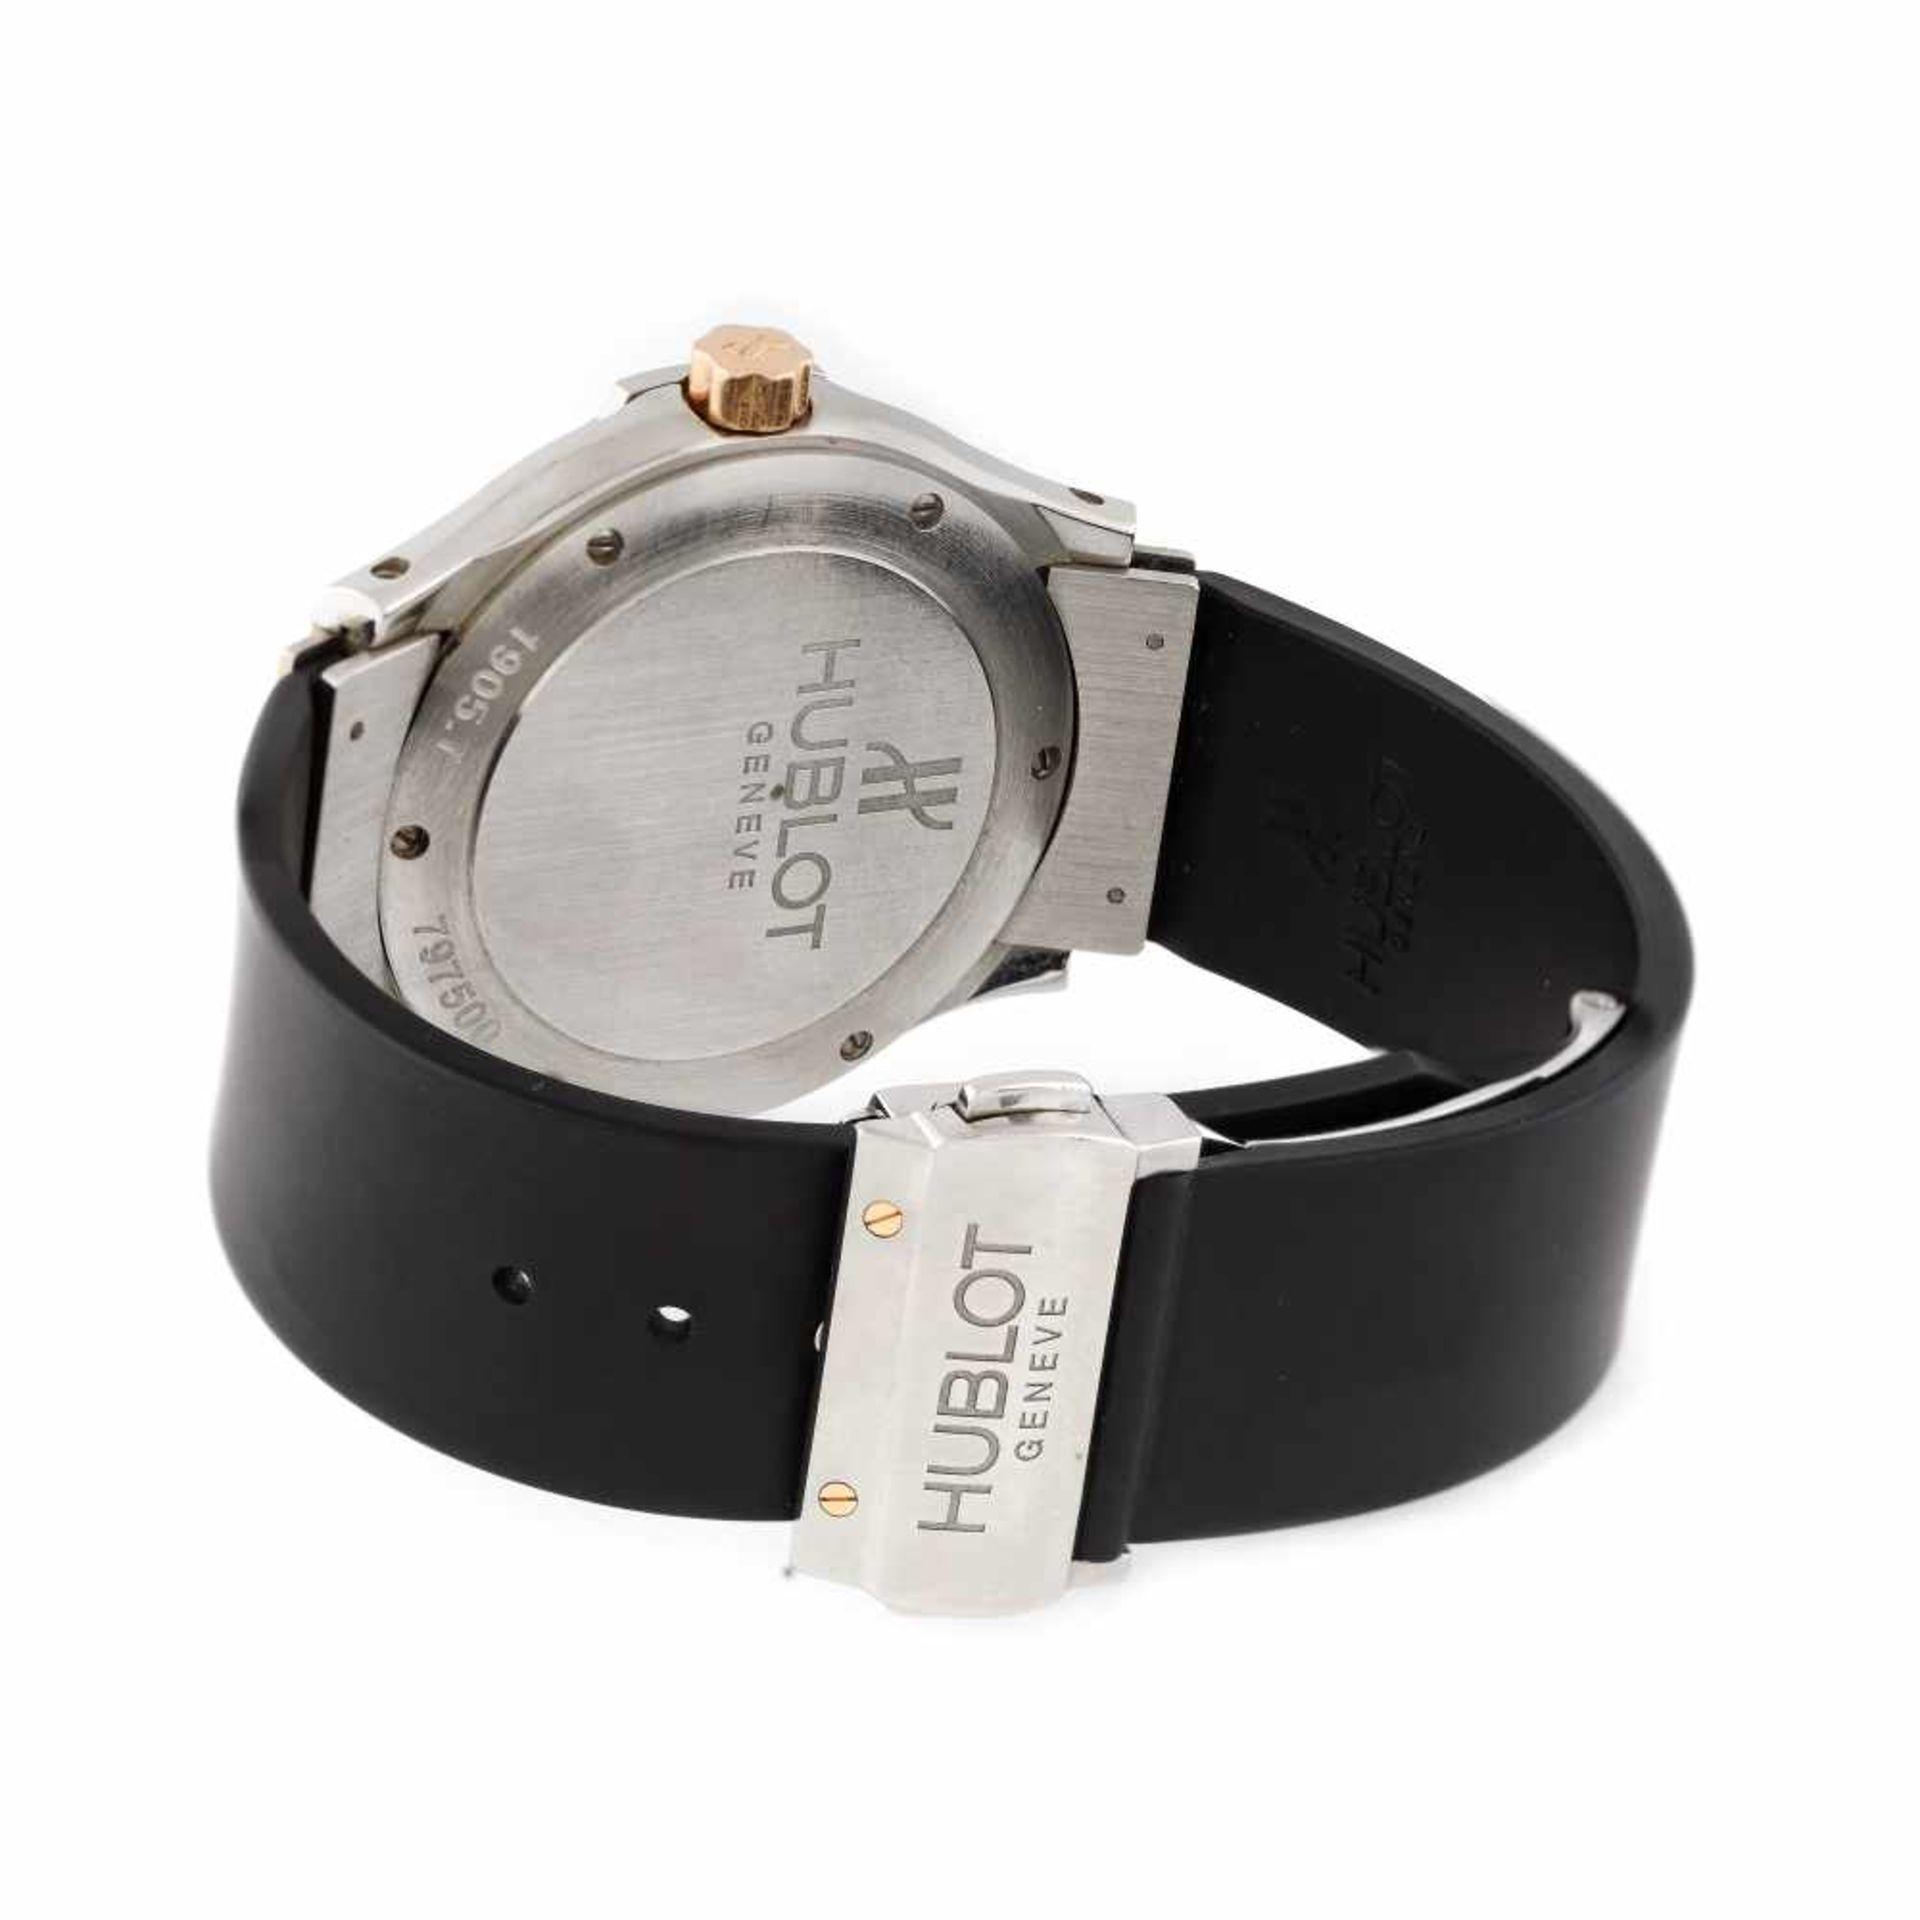 Hublot Classic Fusion wristwatch, steel and rose gold, unisex, provenance documents - Bild 3 aus 3